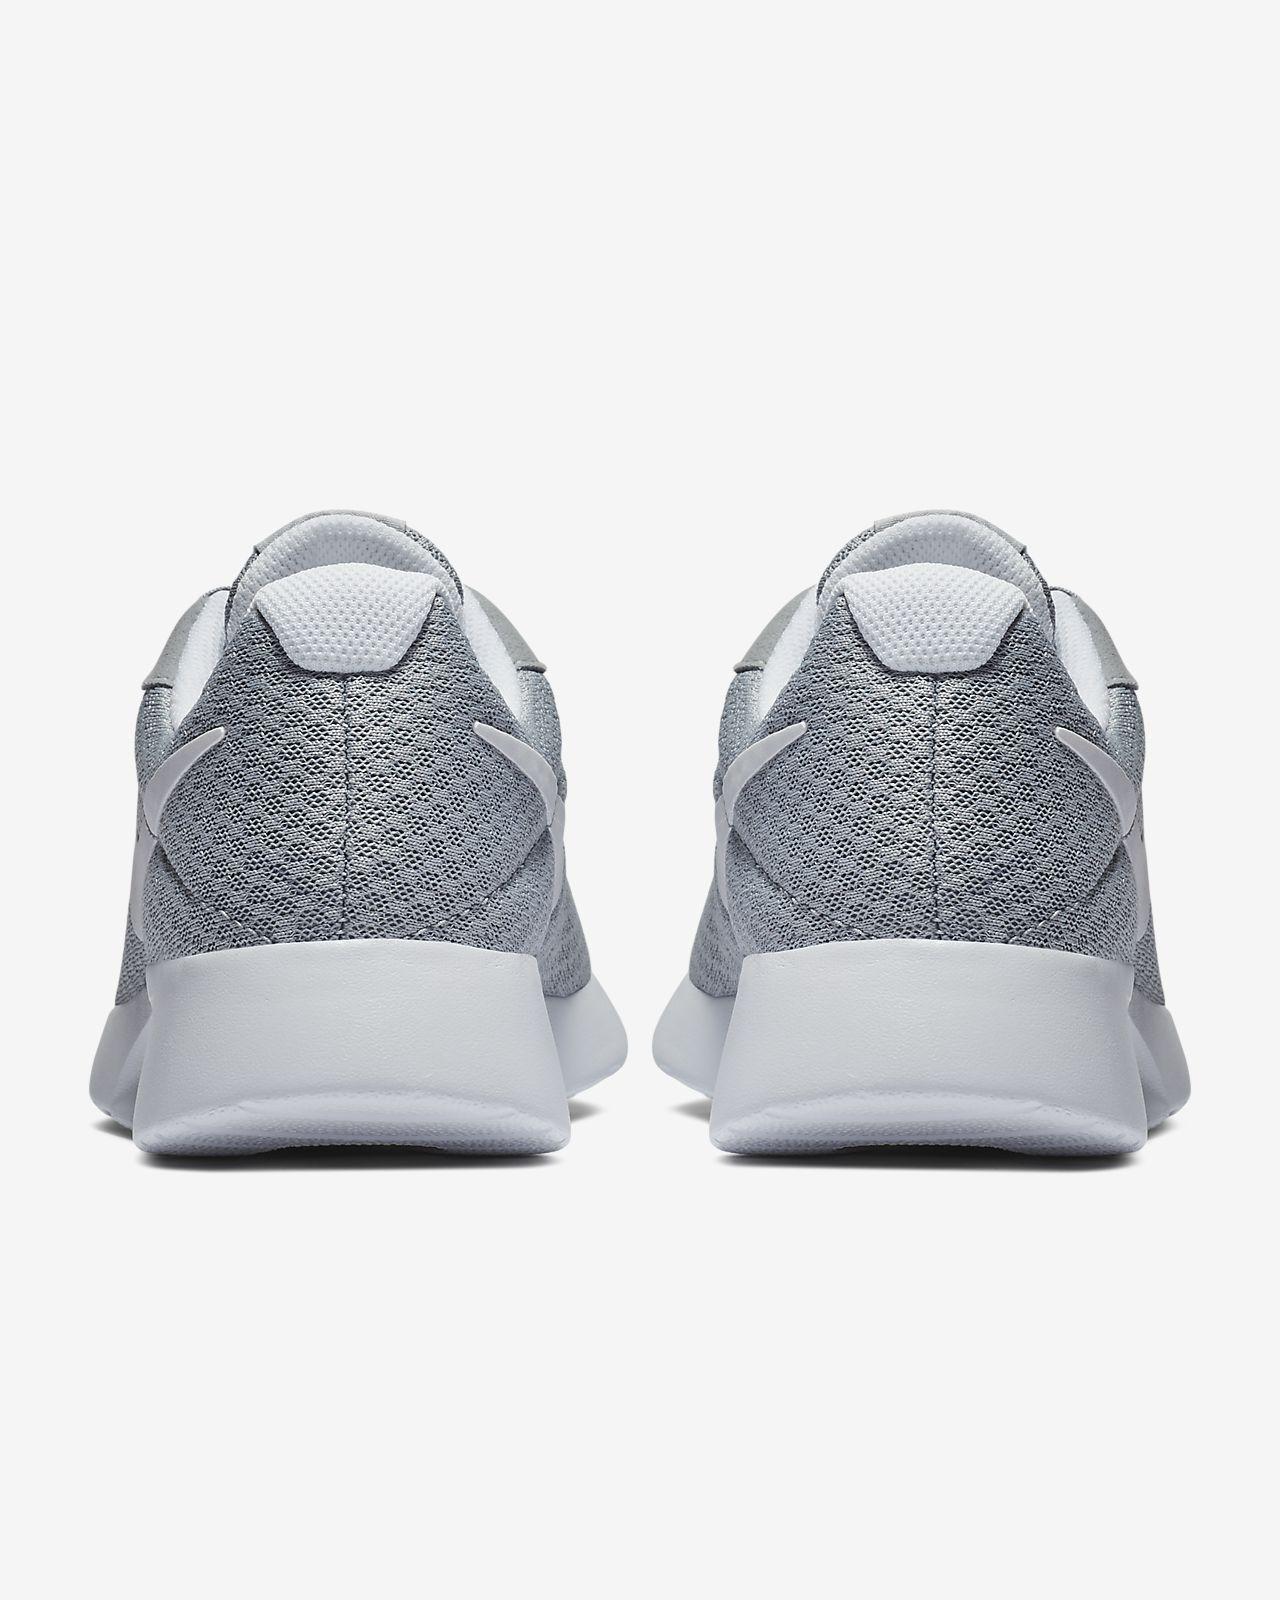 1a34d1e7 Low Resolution Buty damskie Nike Tanjun Buty damskie Nike Tanjun